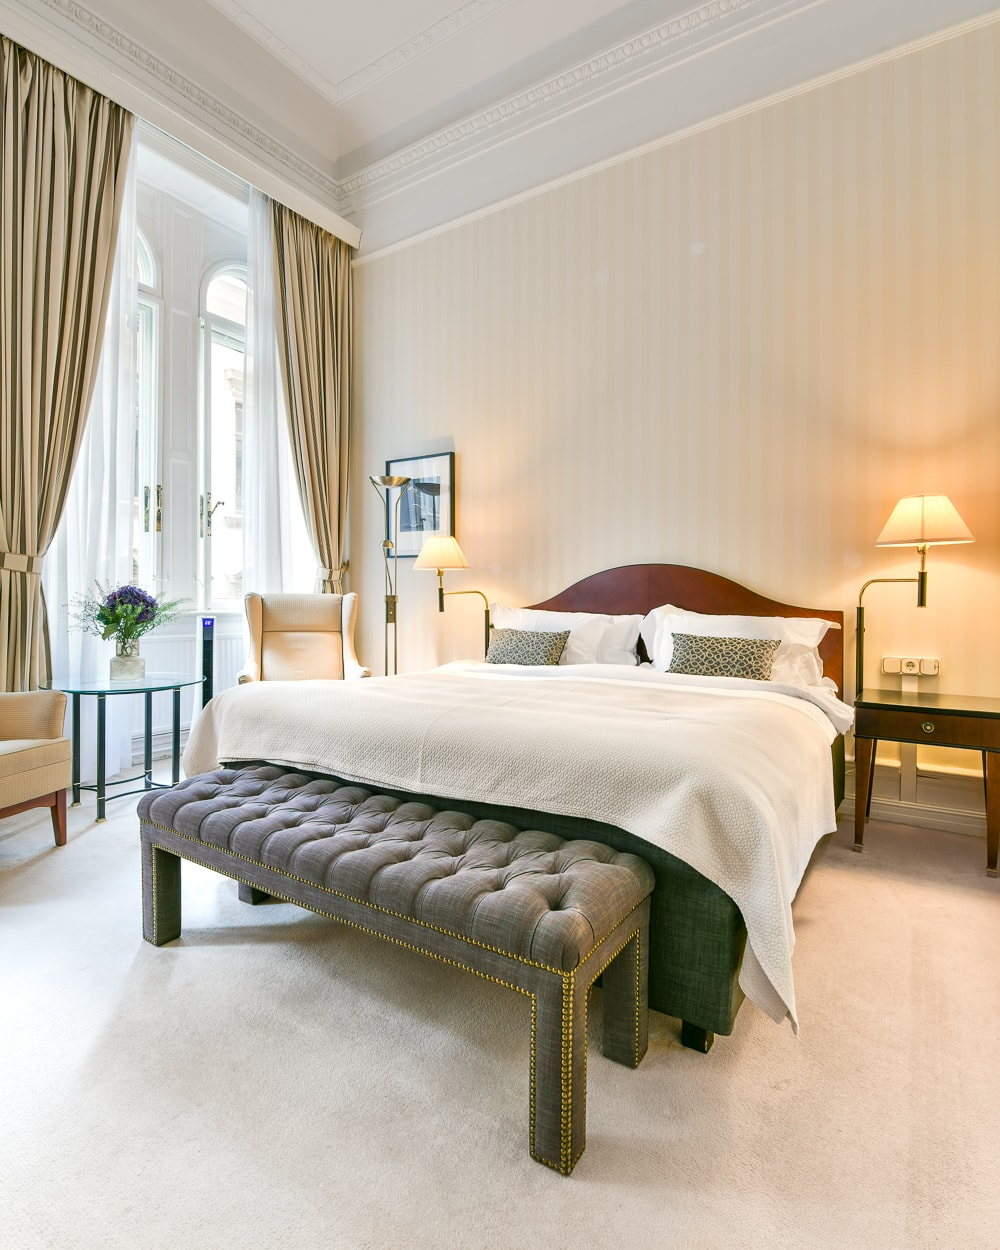 Juniorsvit Elite Plaza Hotel Göteborg-3